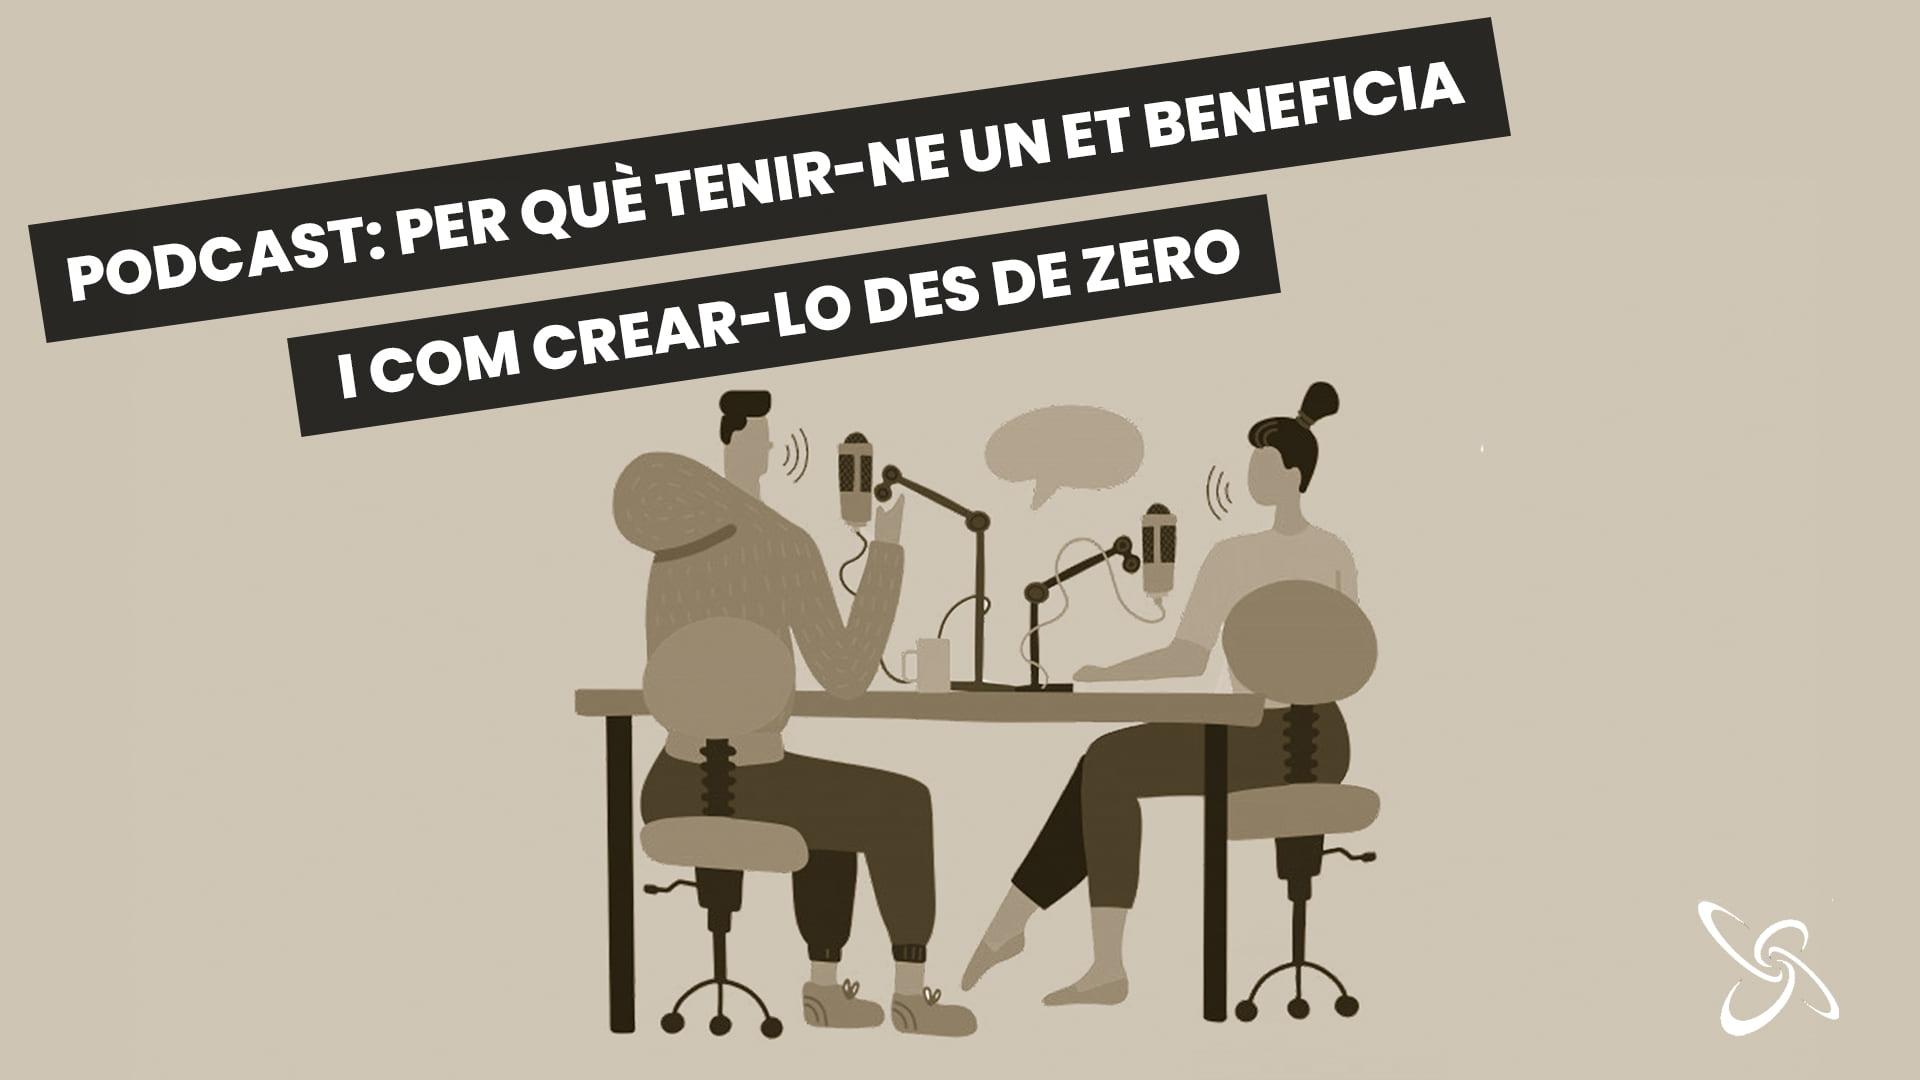 Podcast: per què tenir-ne et beneficia